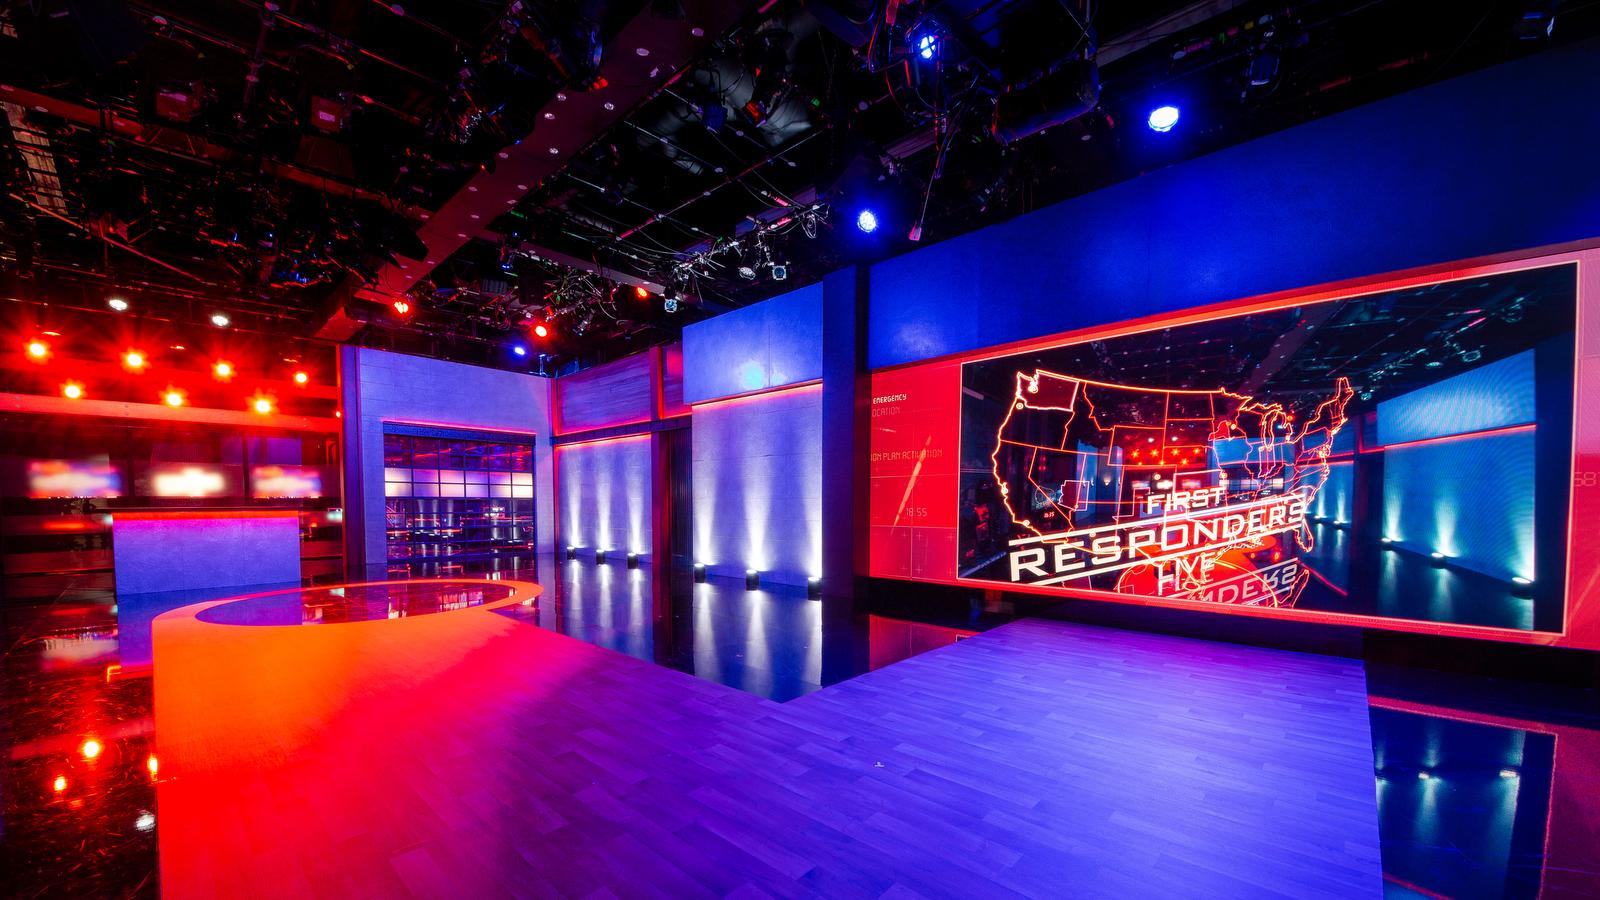 NCS_First-Responders-Live_Fox-AR-Set_0010